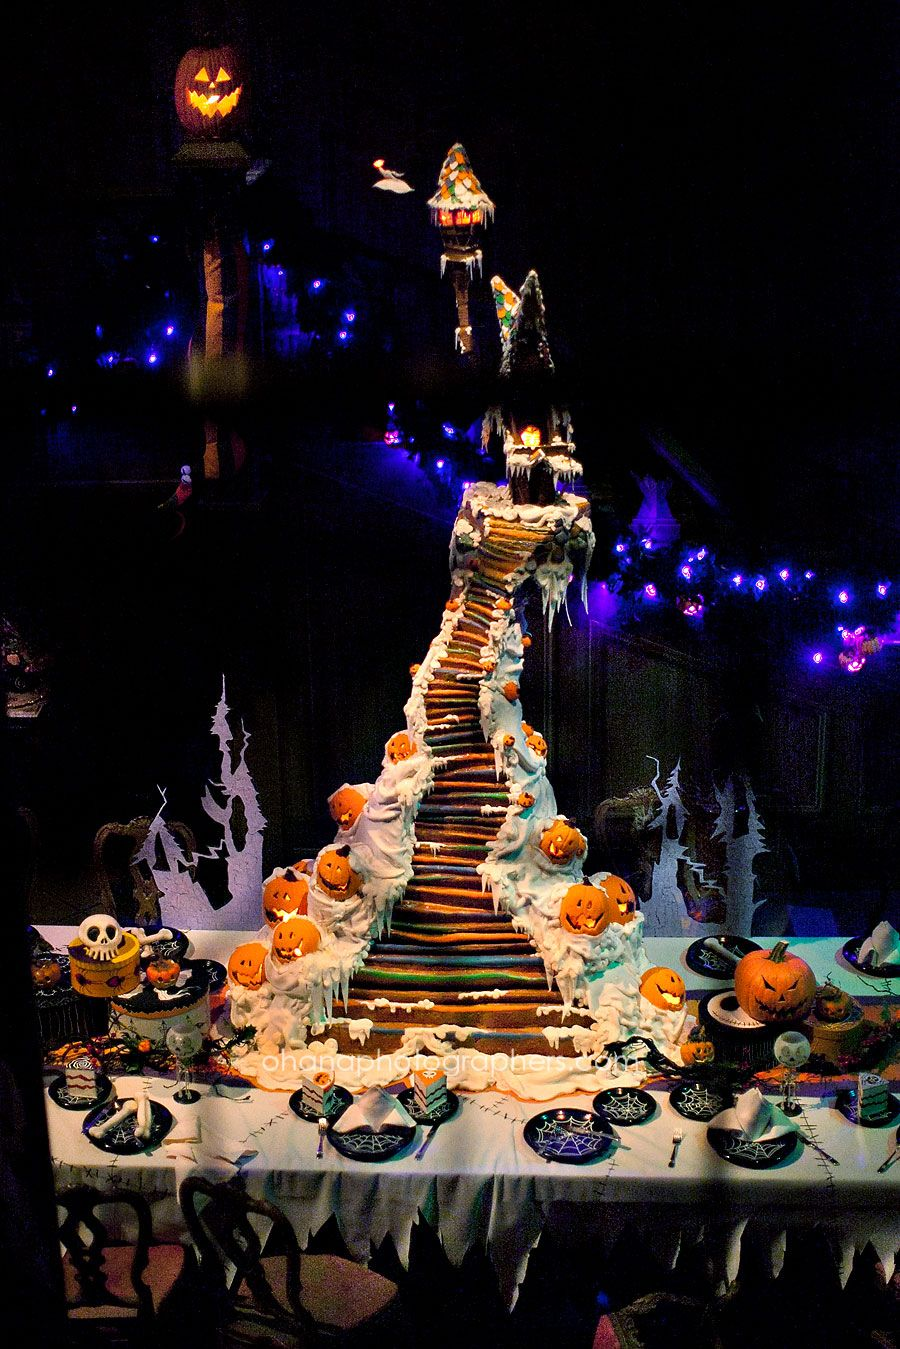 Disneyland Haunted Mansion Holiday // Gingerbread House